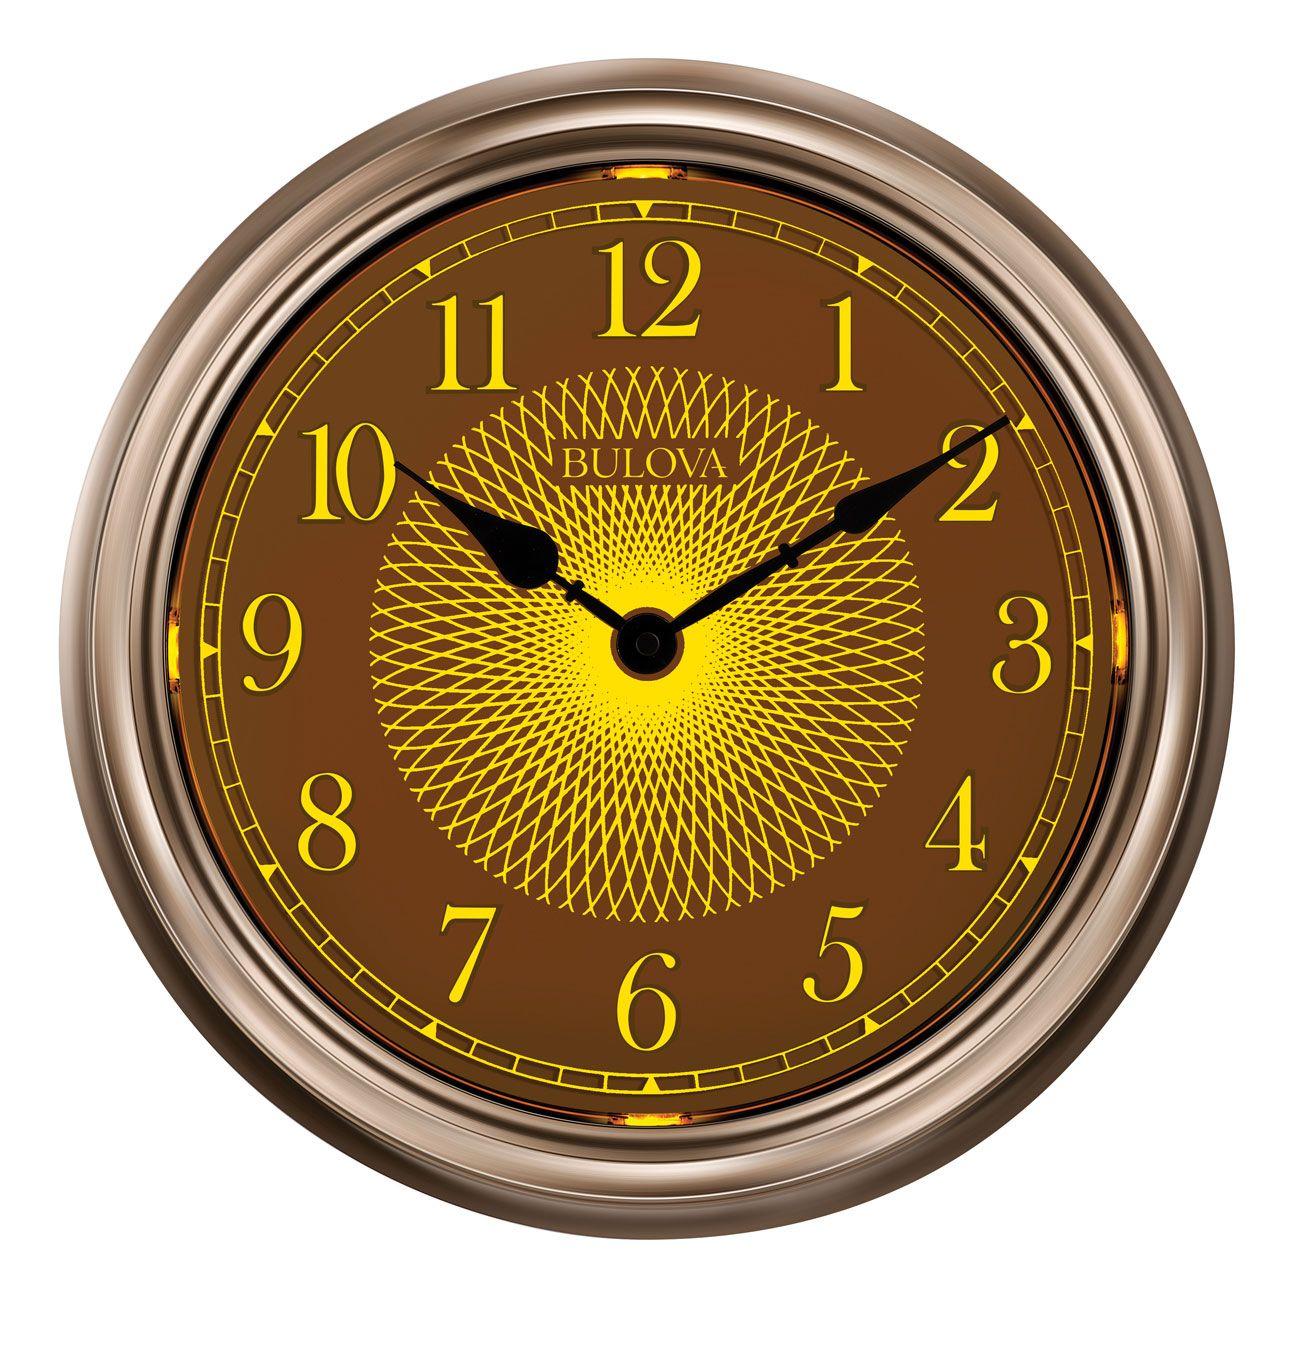 C4826 Light Time By Bulova Clocks Great Ideas Pinterest Bulova